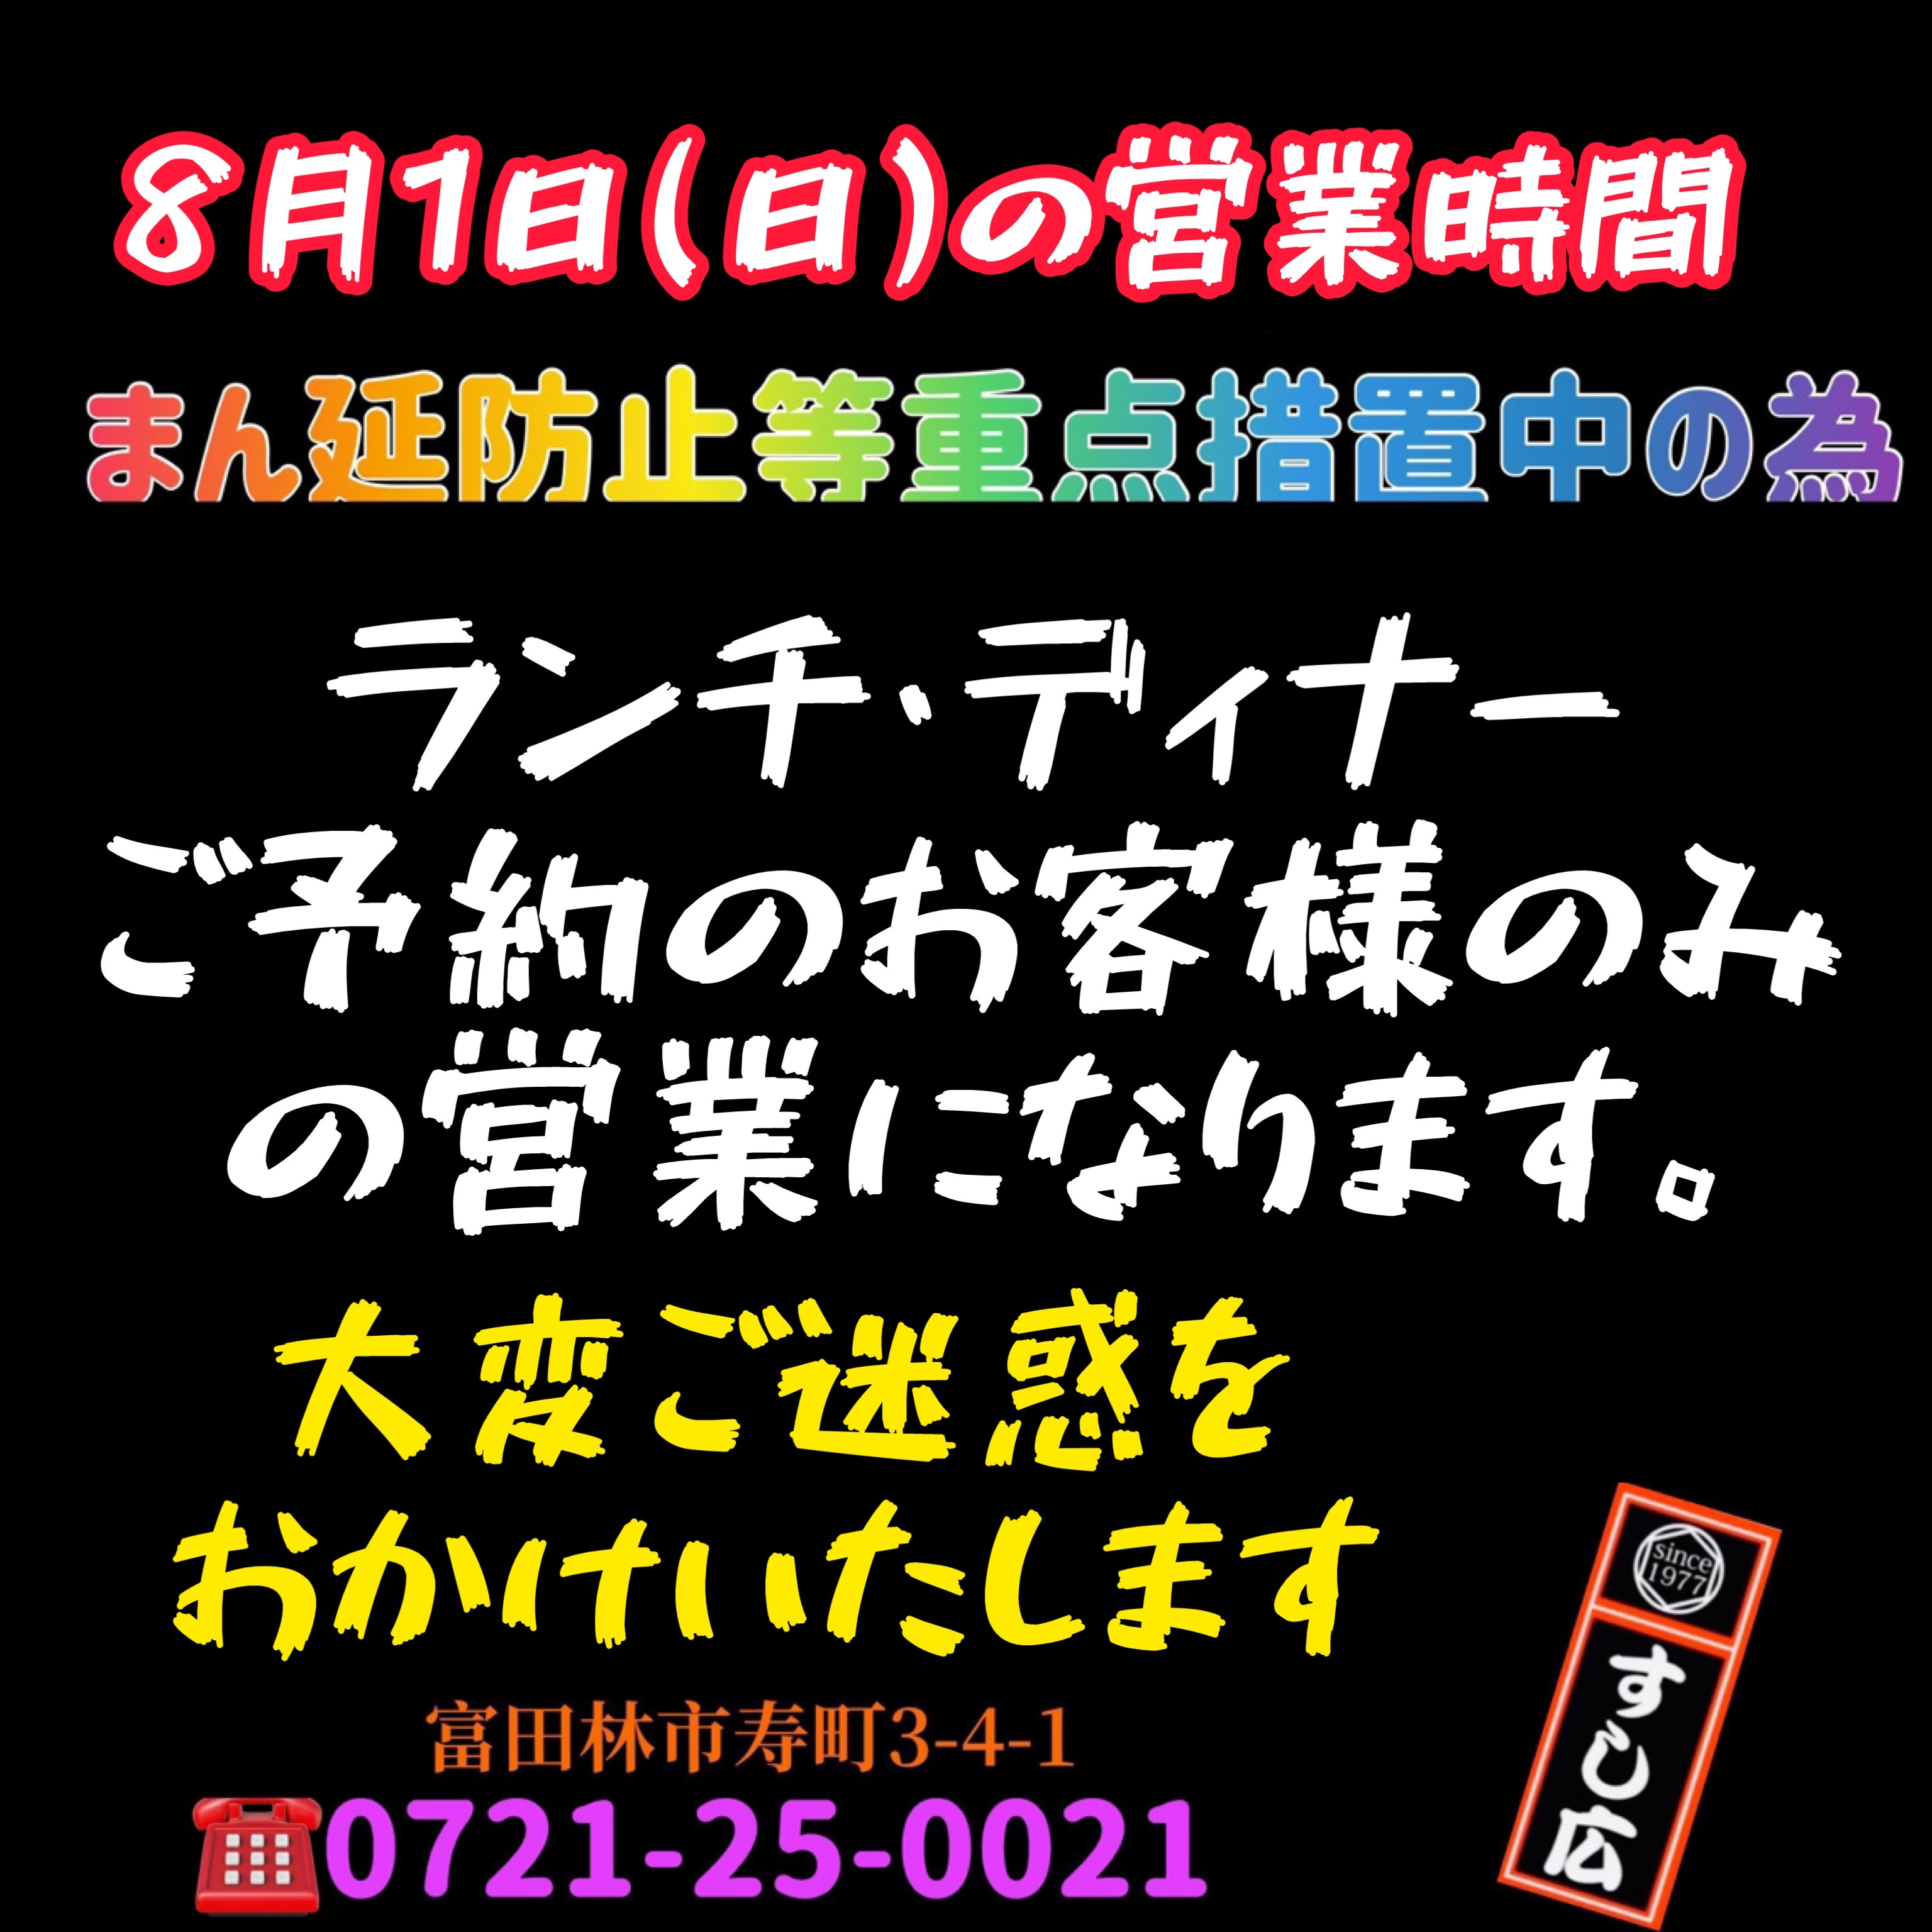 f:id:carp_0301_kenta:20210801063224j:image